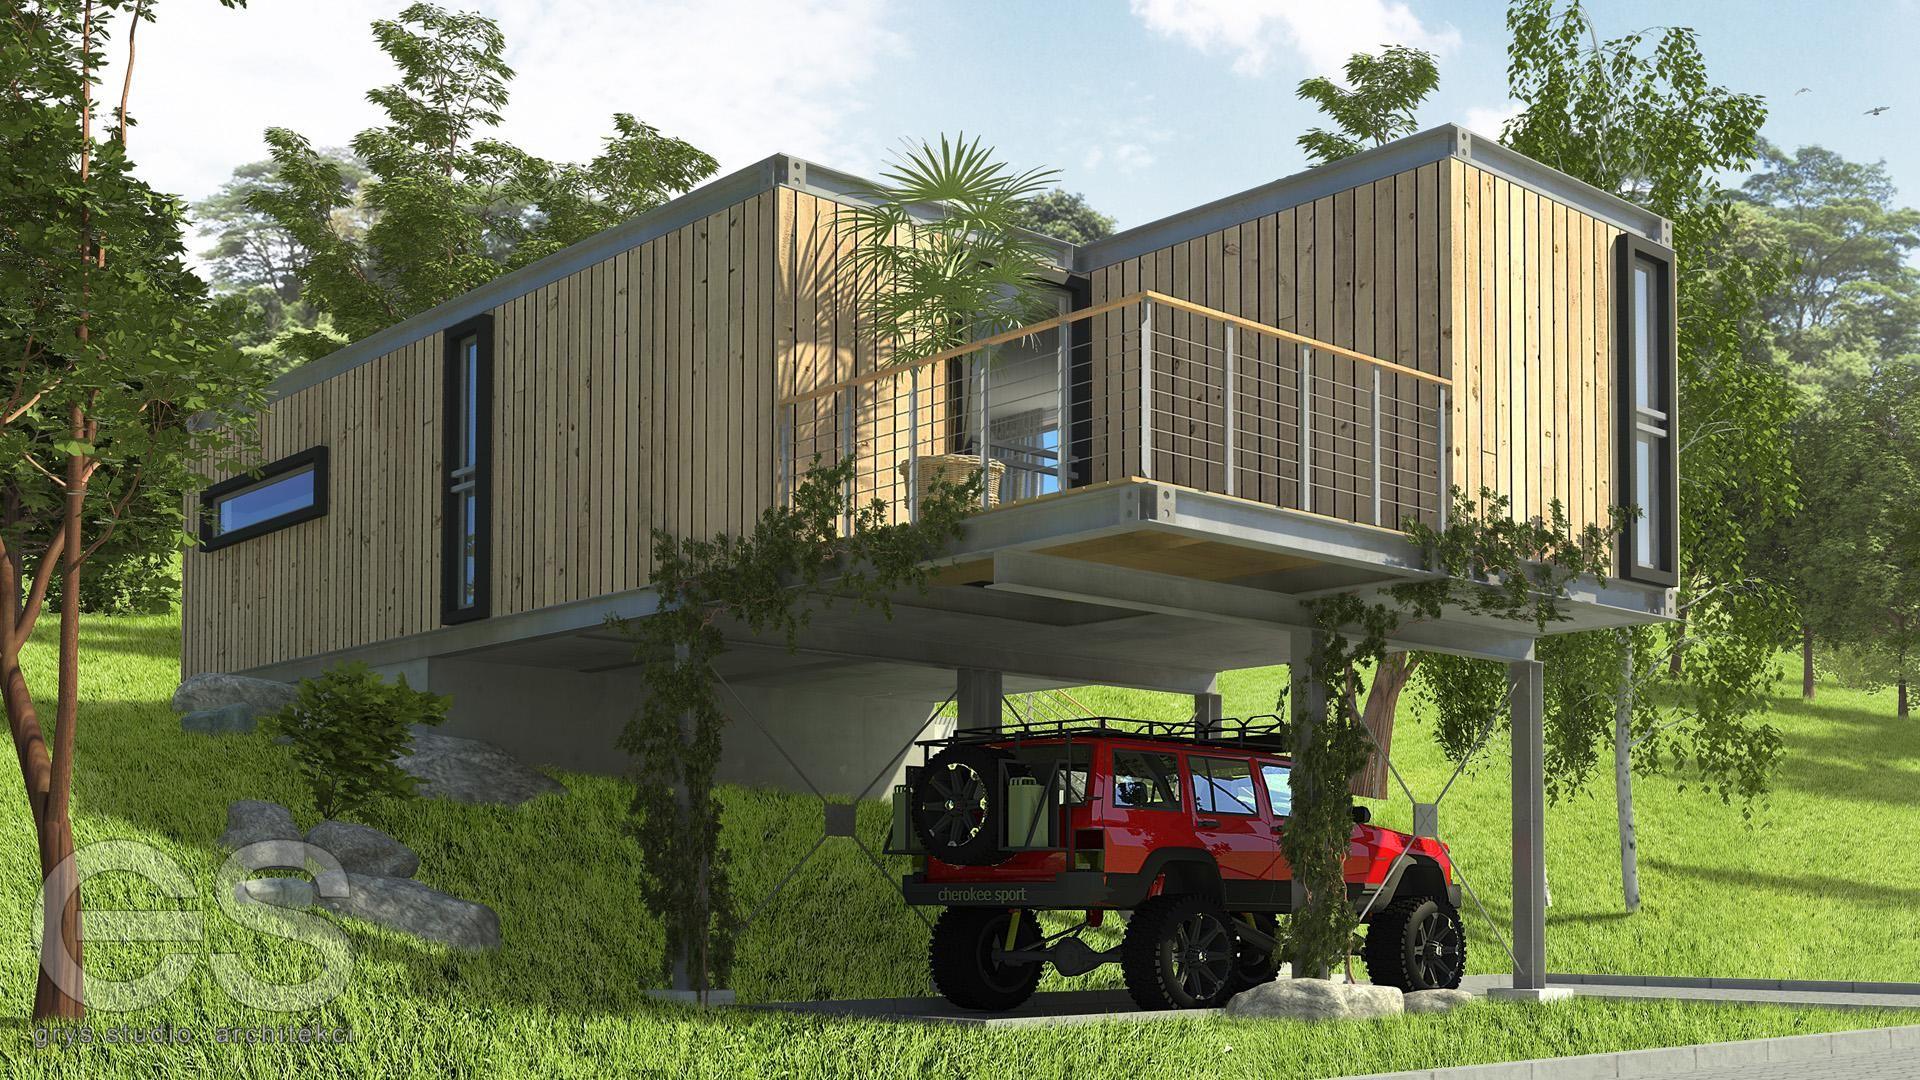 Hervorragend Modular Container House